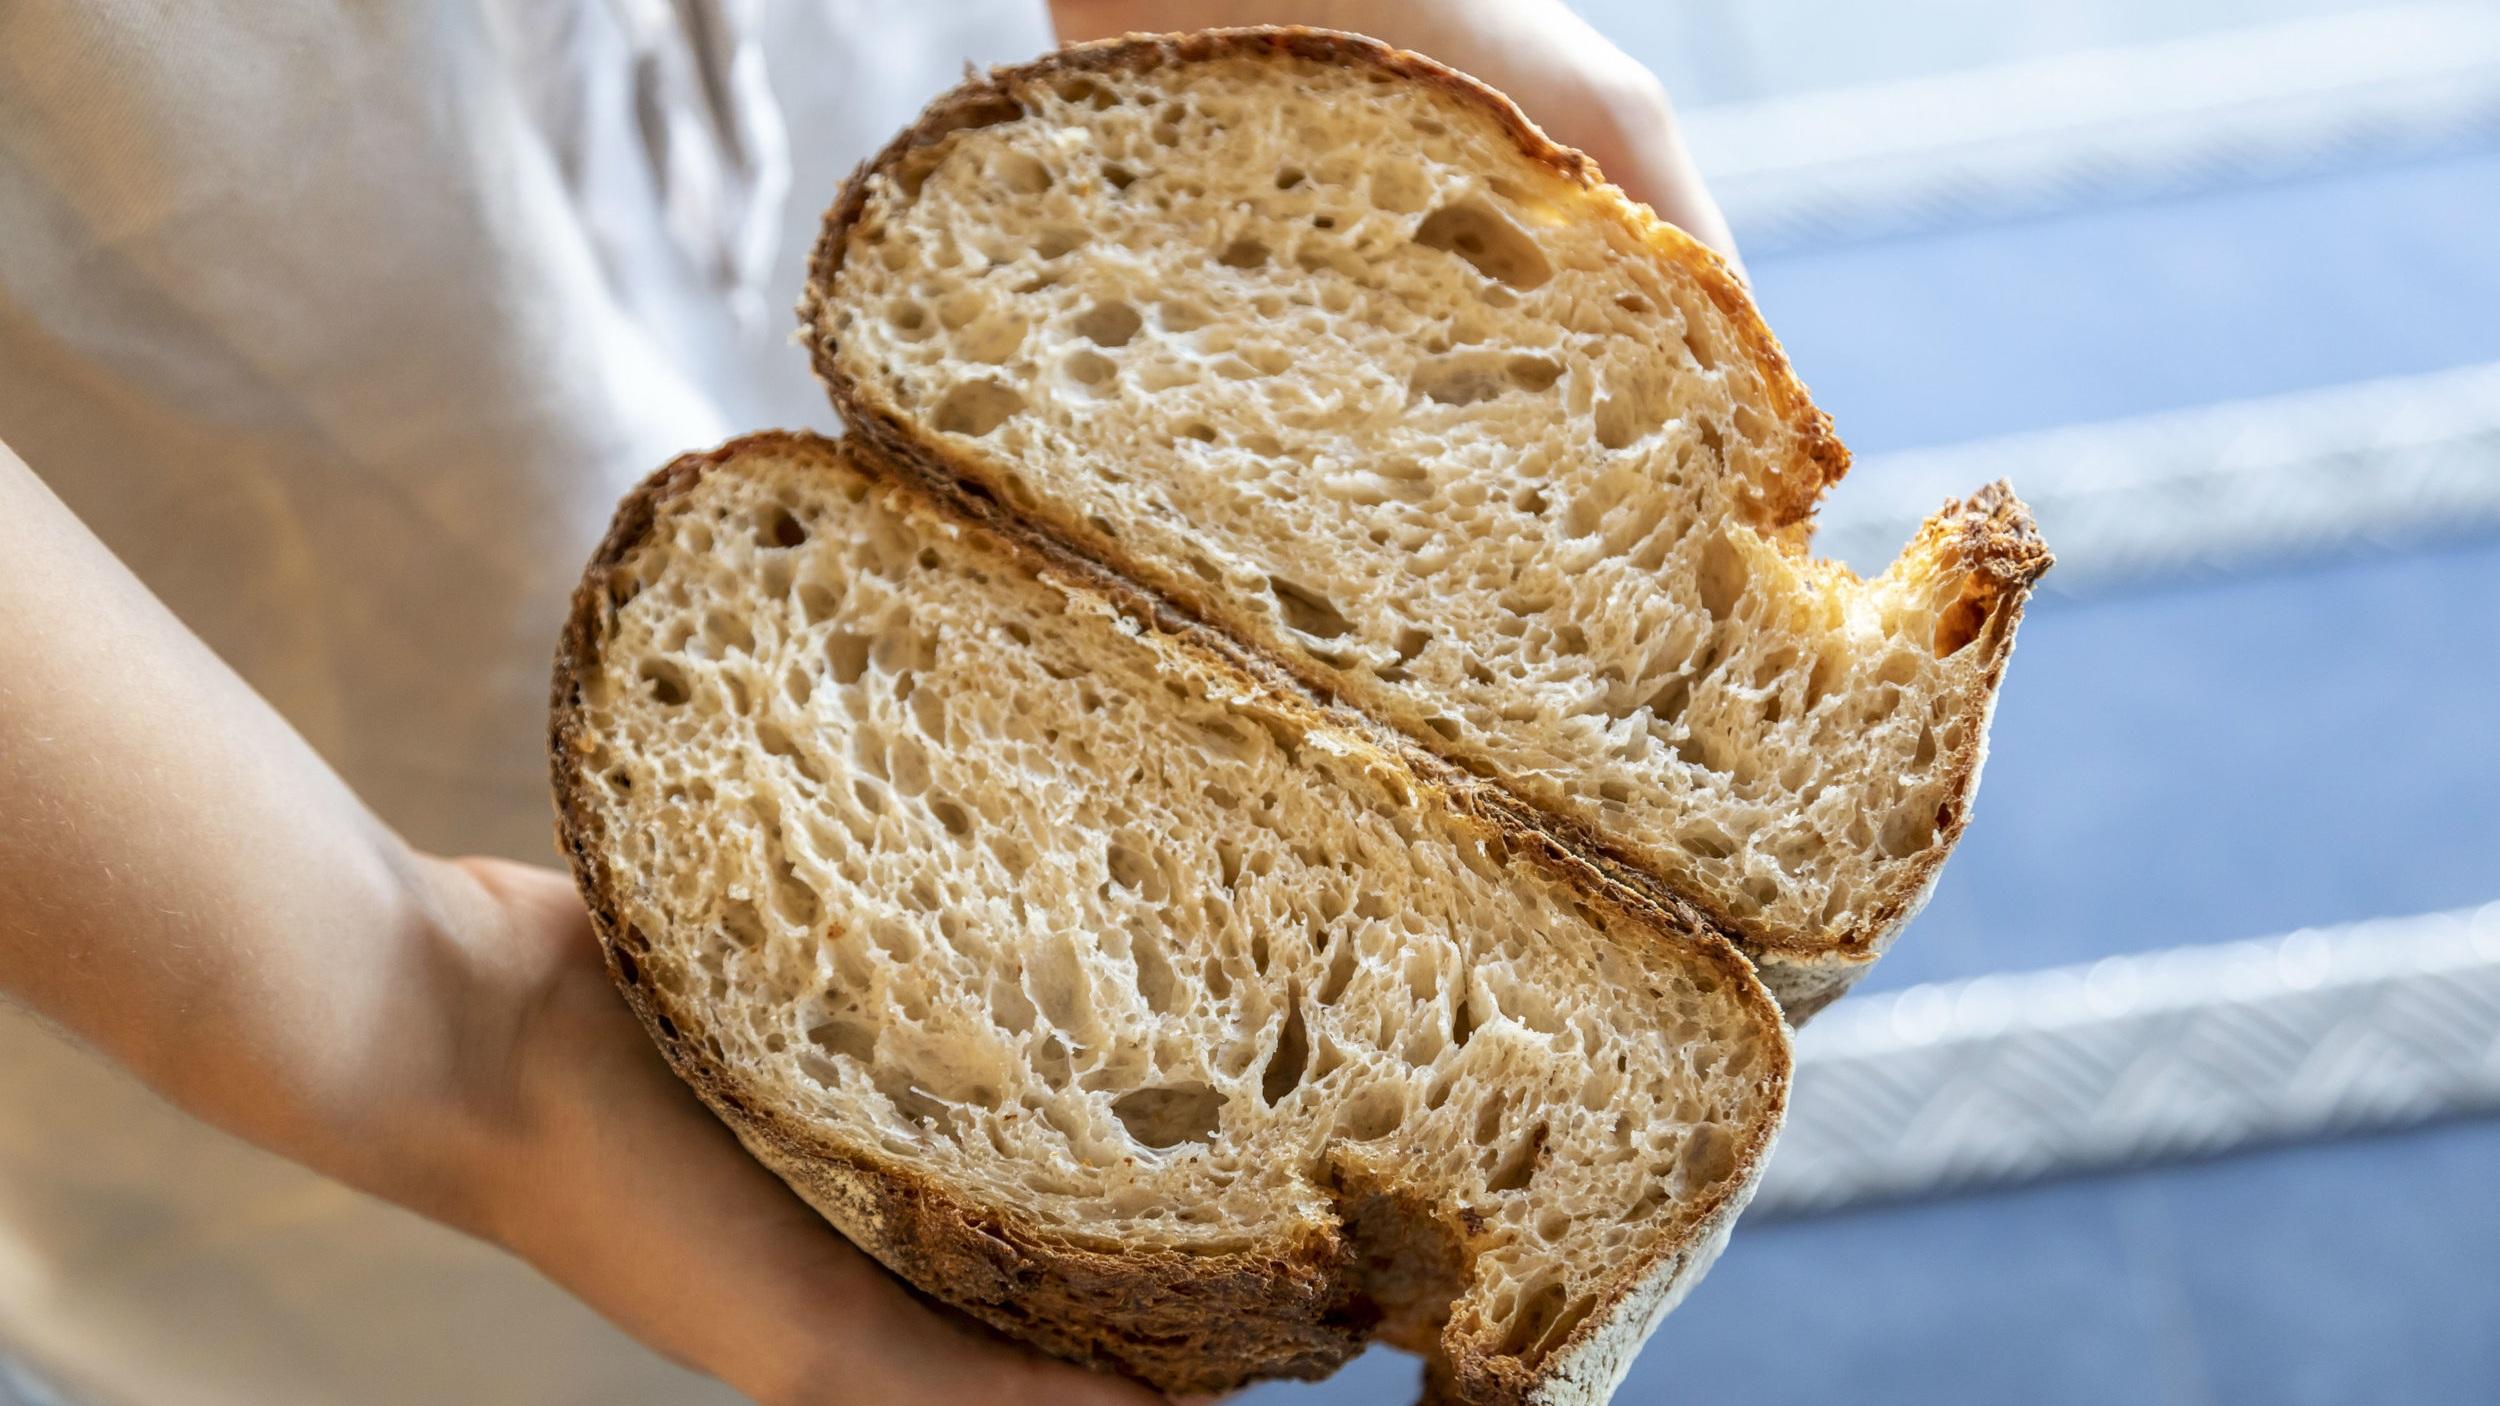 GAIL%27s+Waste+Bread+%283%29.jpg